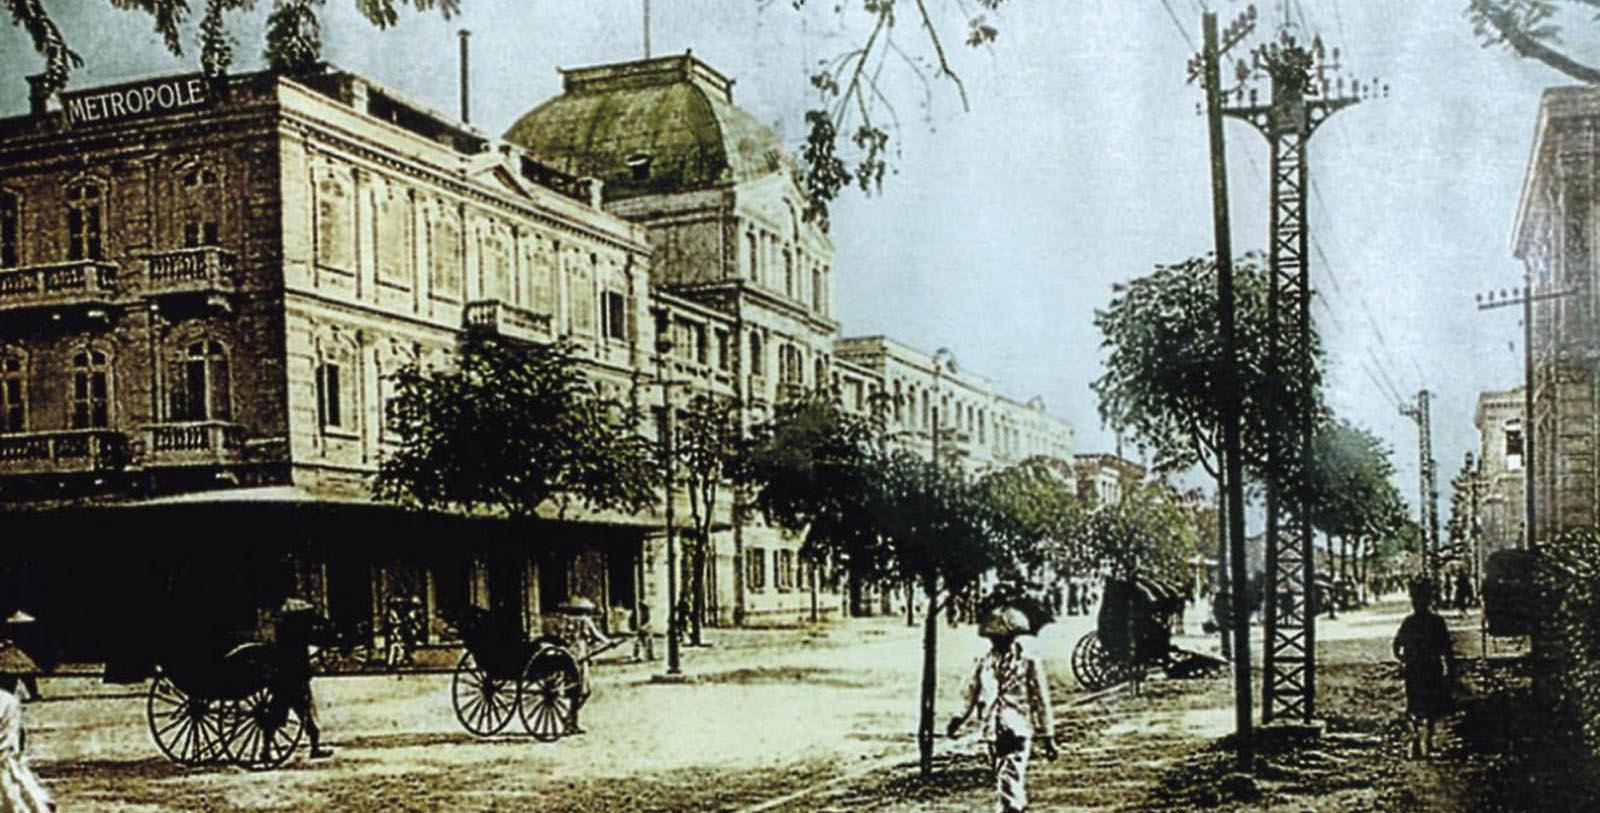 Historic Exterior of Hotel Metropole in Hanoi, Vietnam